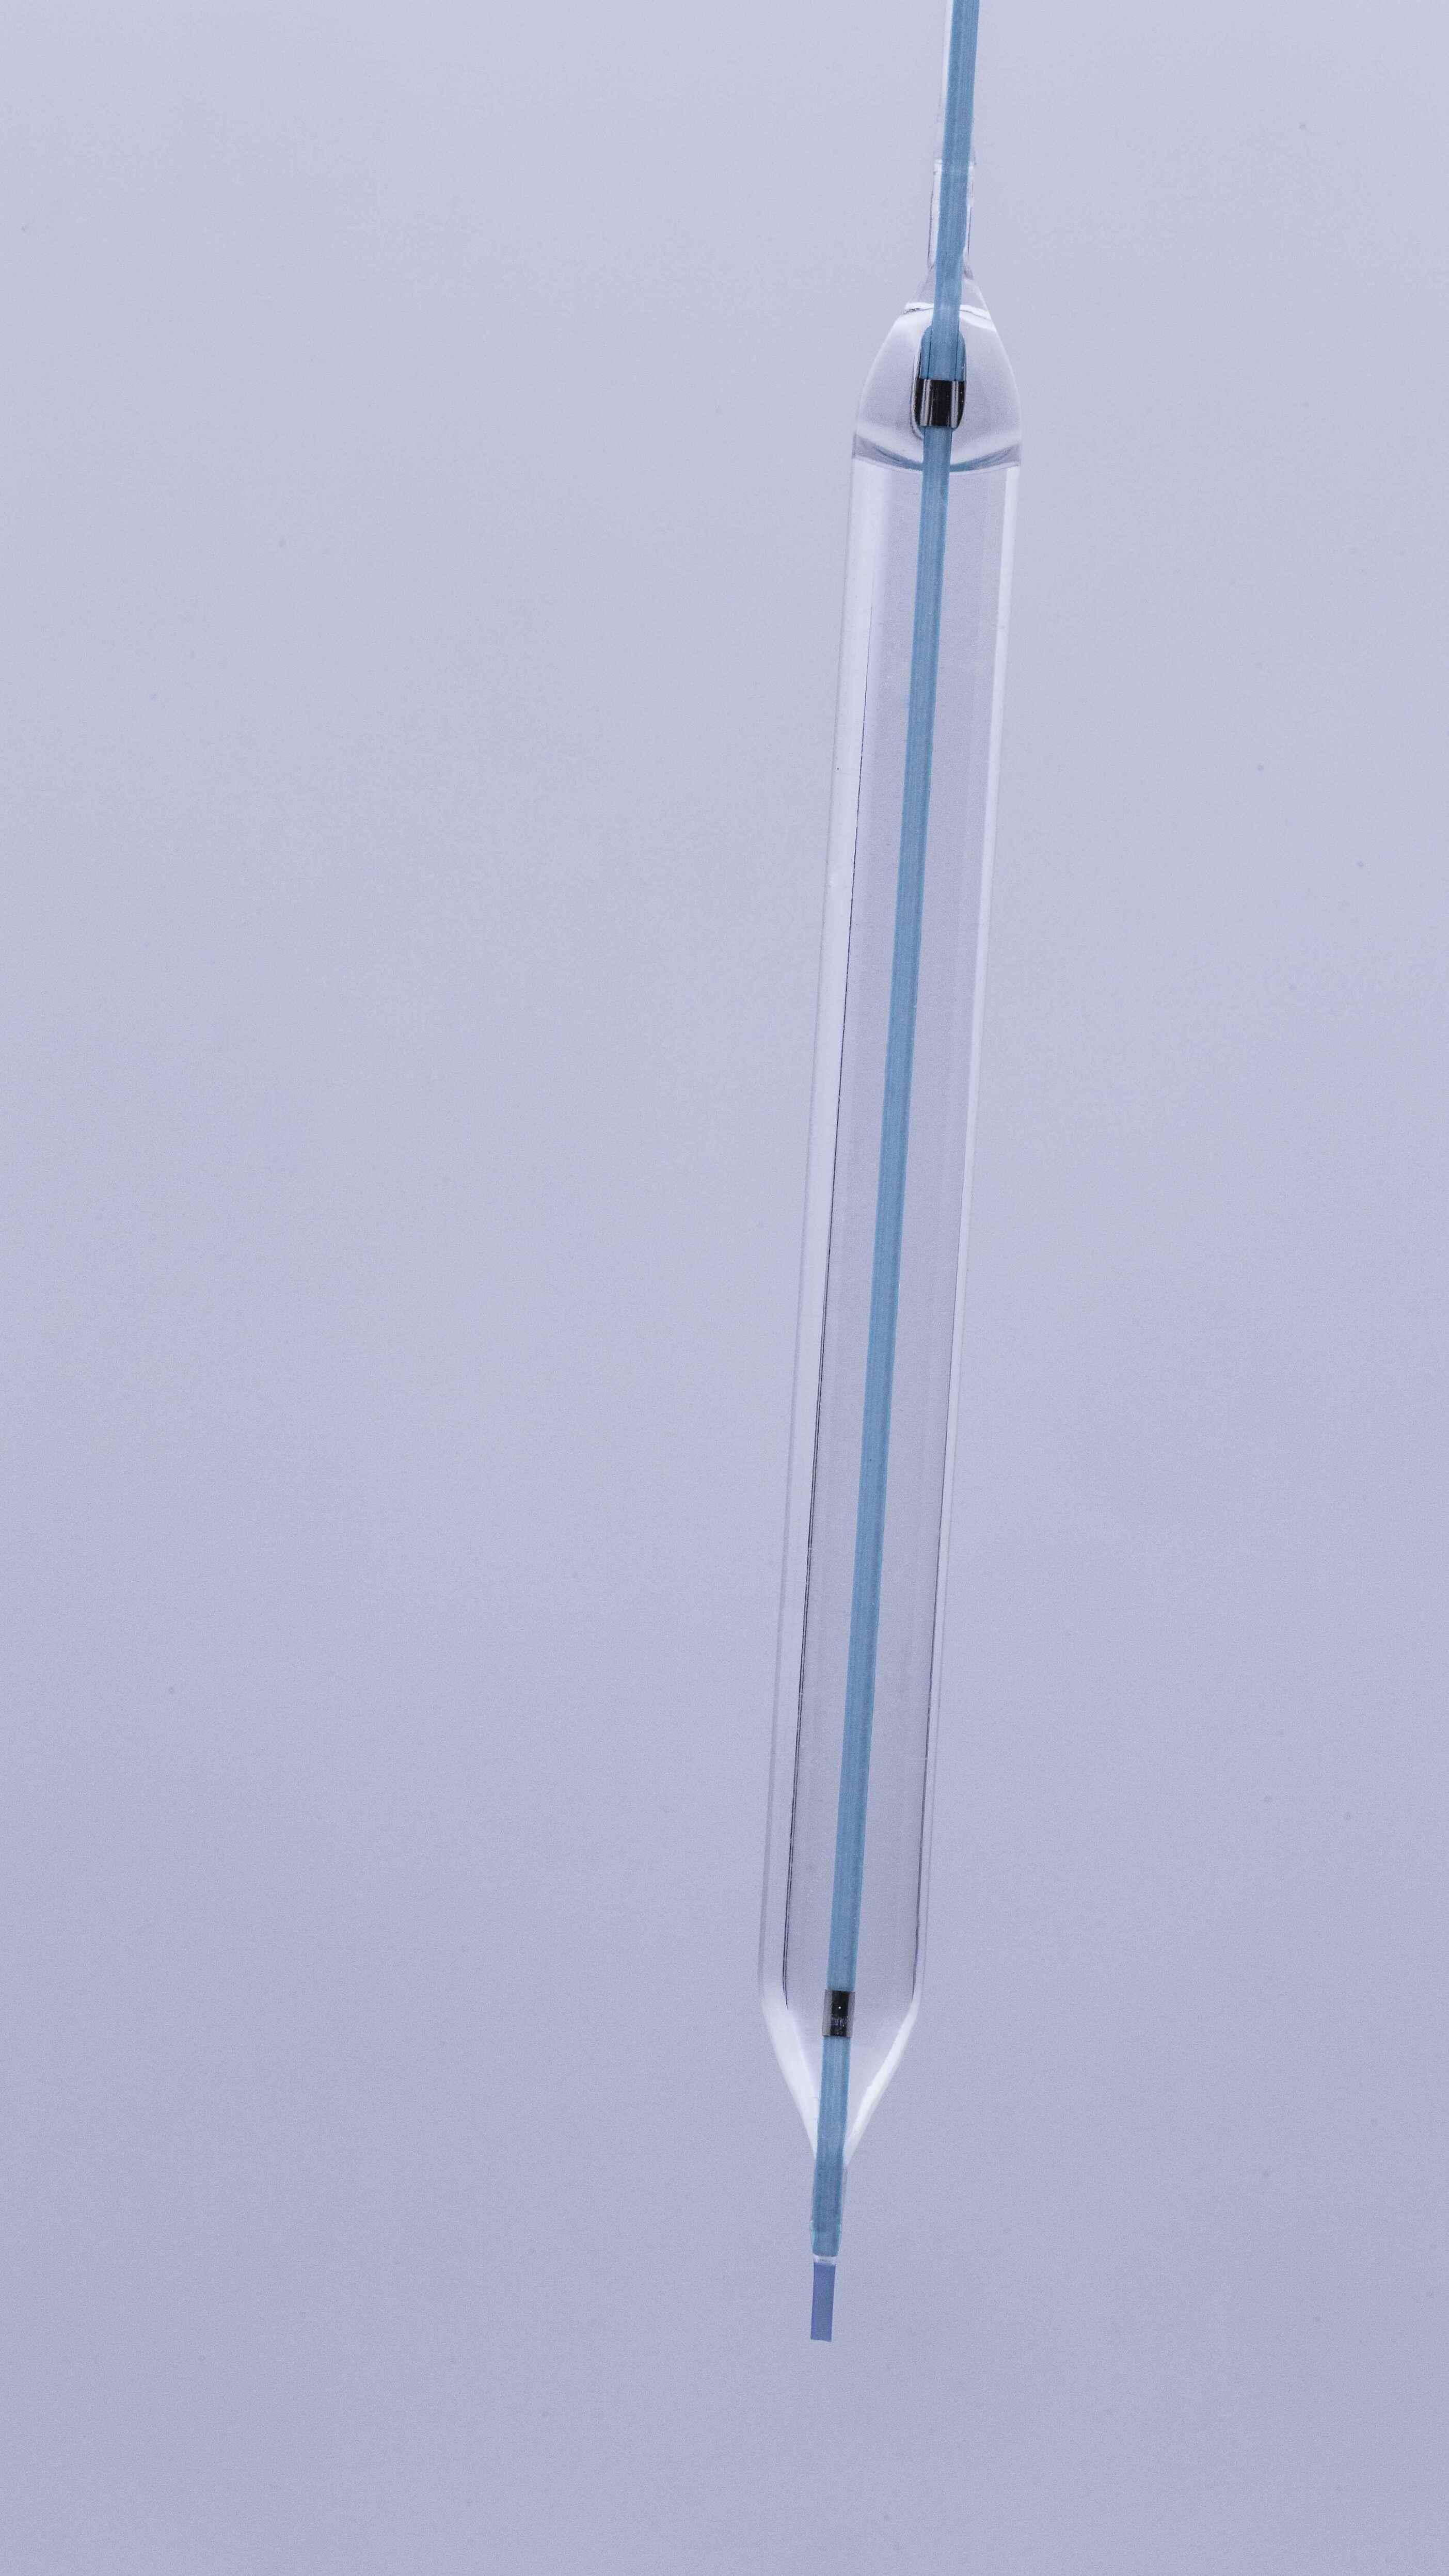 Ptca Balloon Dilatation Catheter Medical Supplies